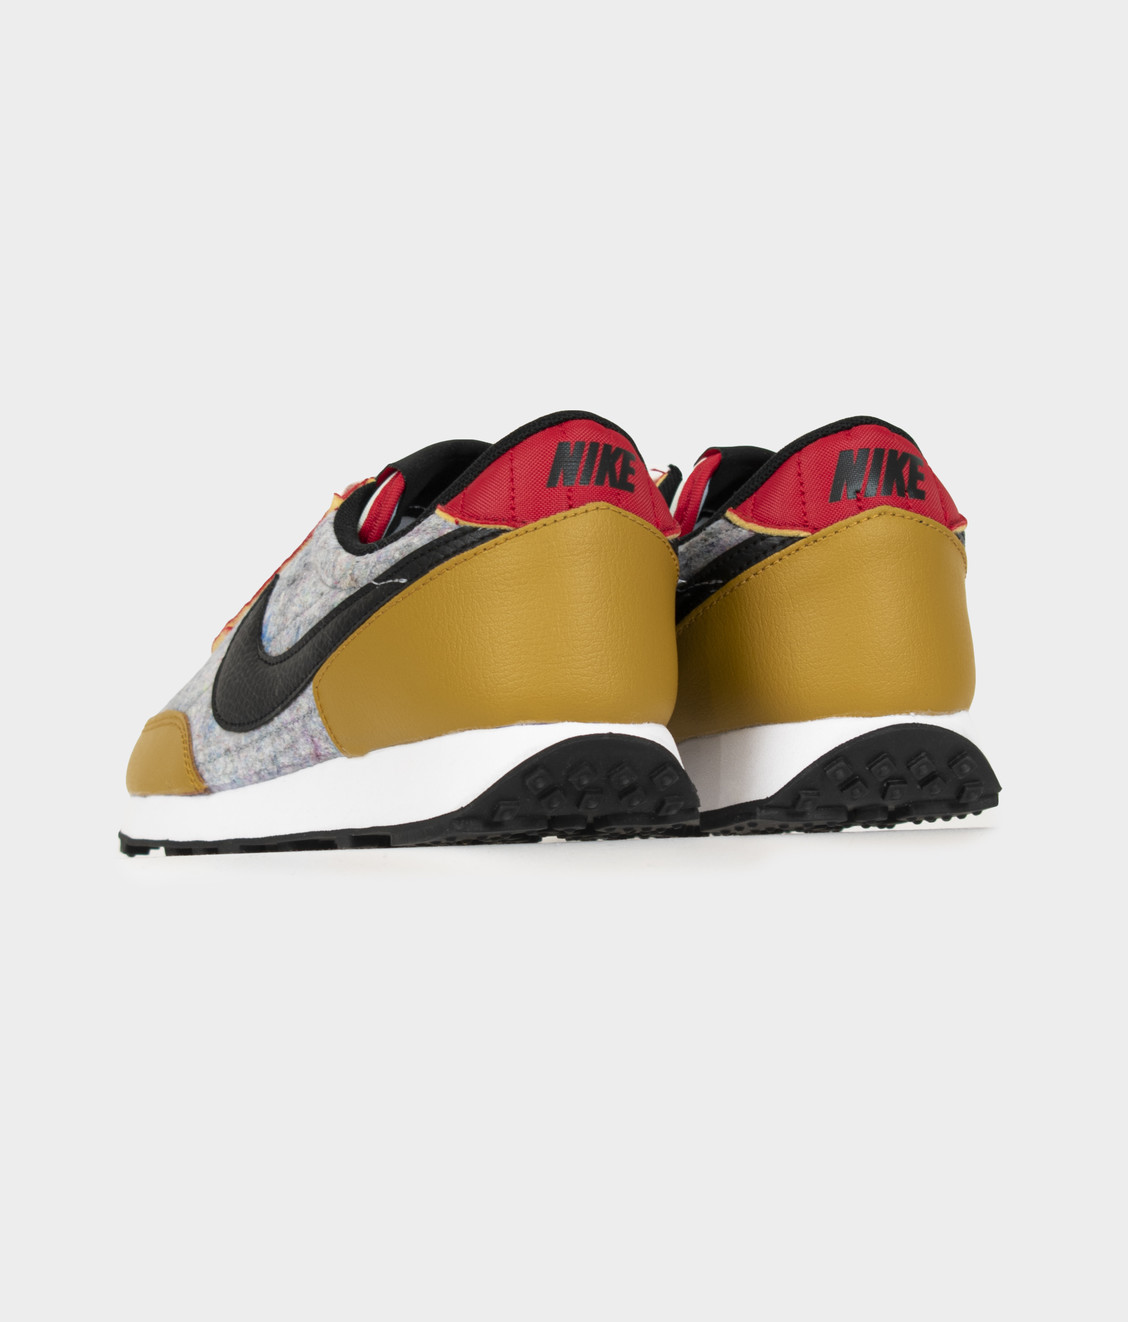 Nike Nike W Daybreak QS Gold Suede Black Multi